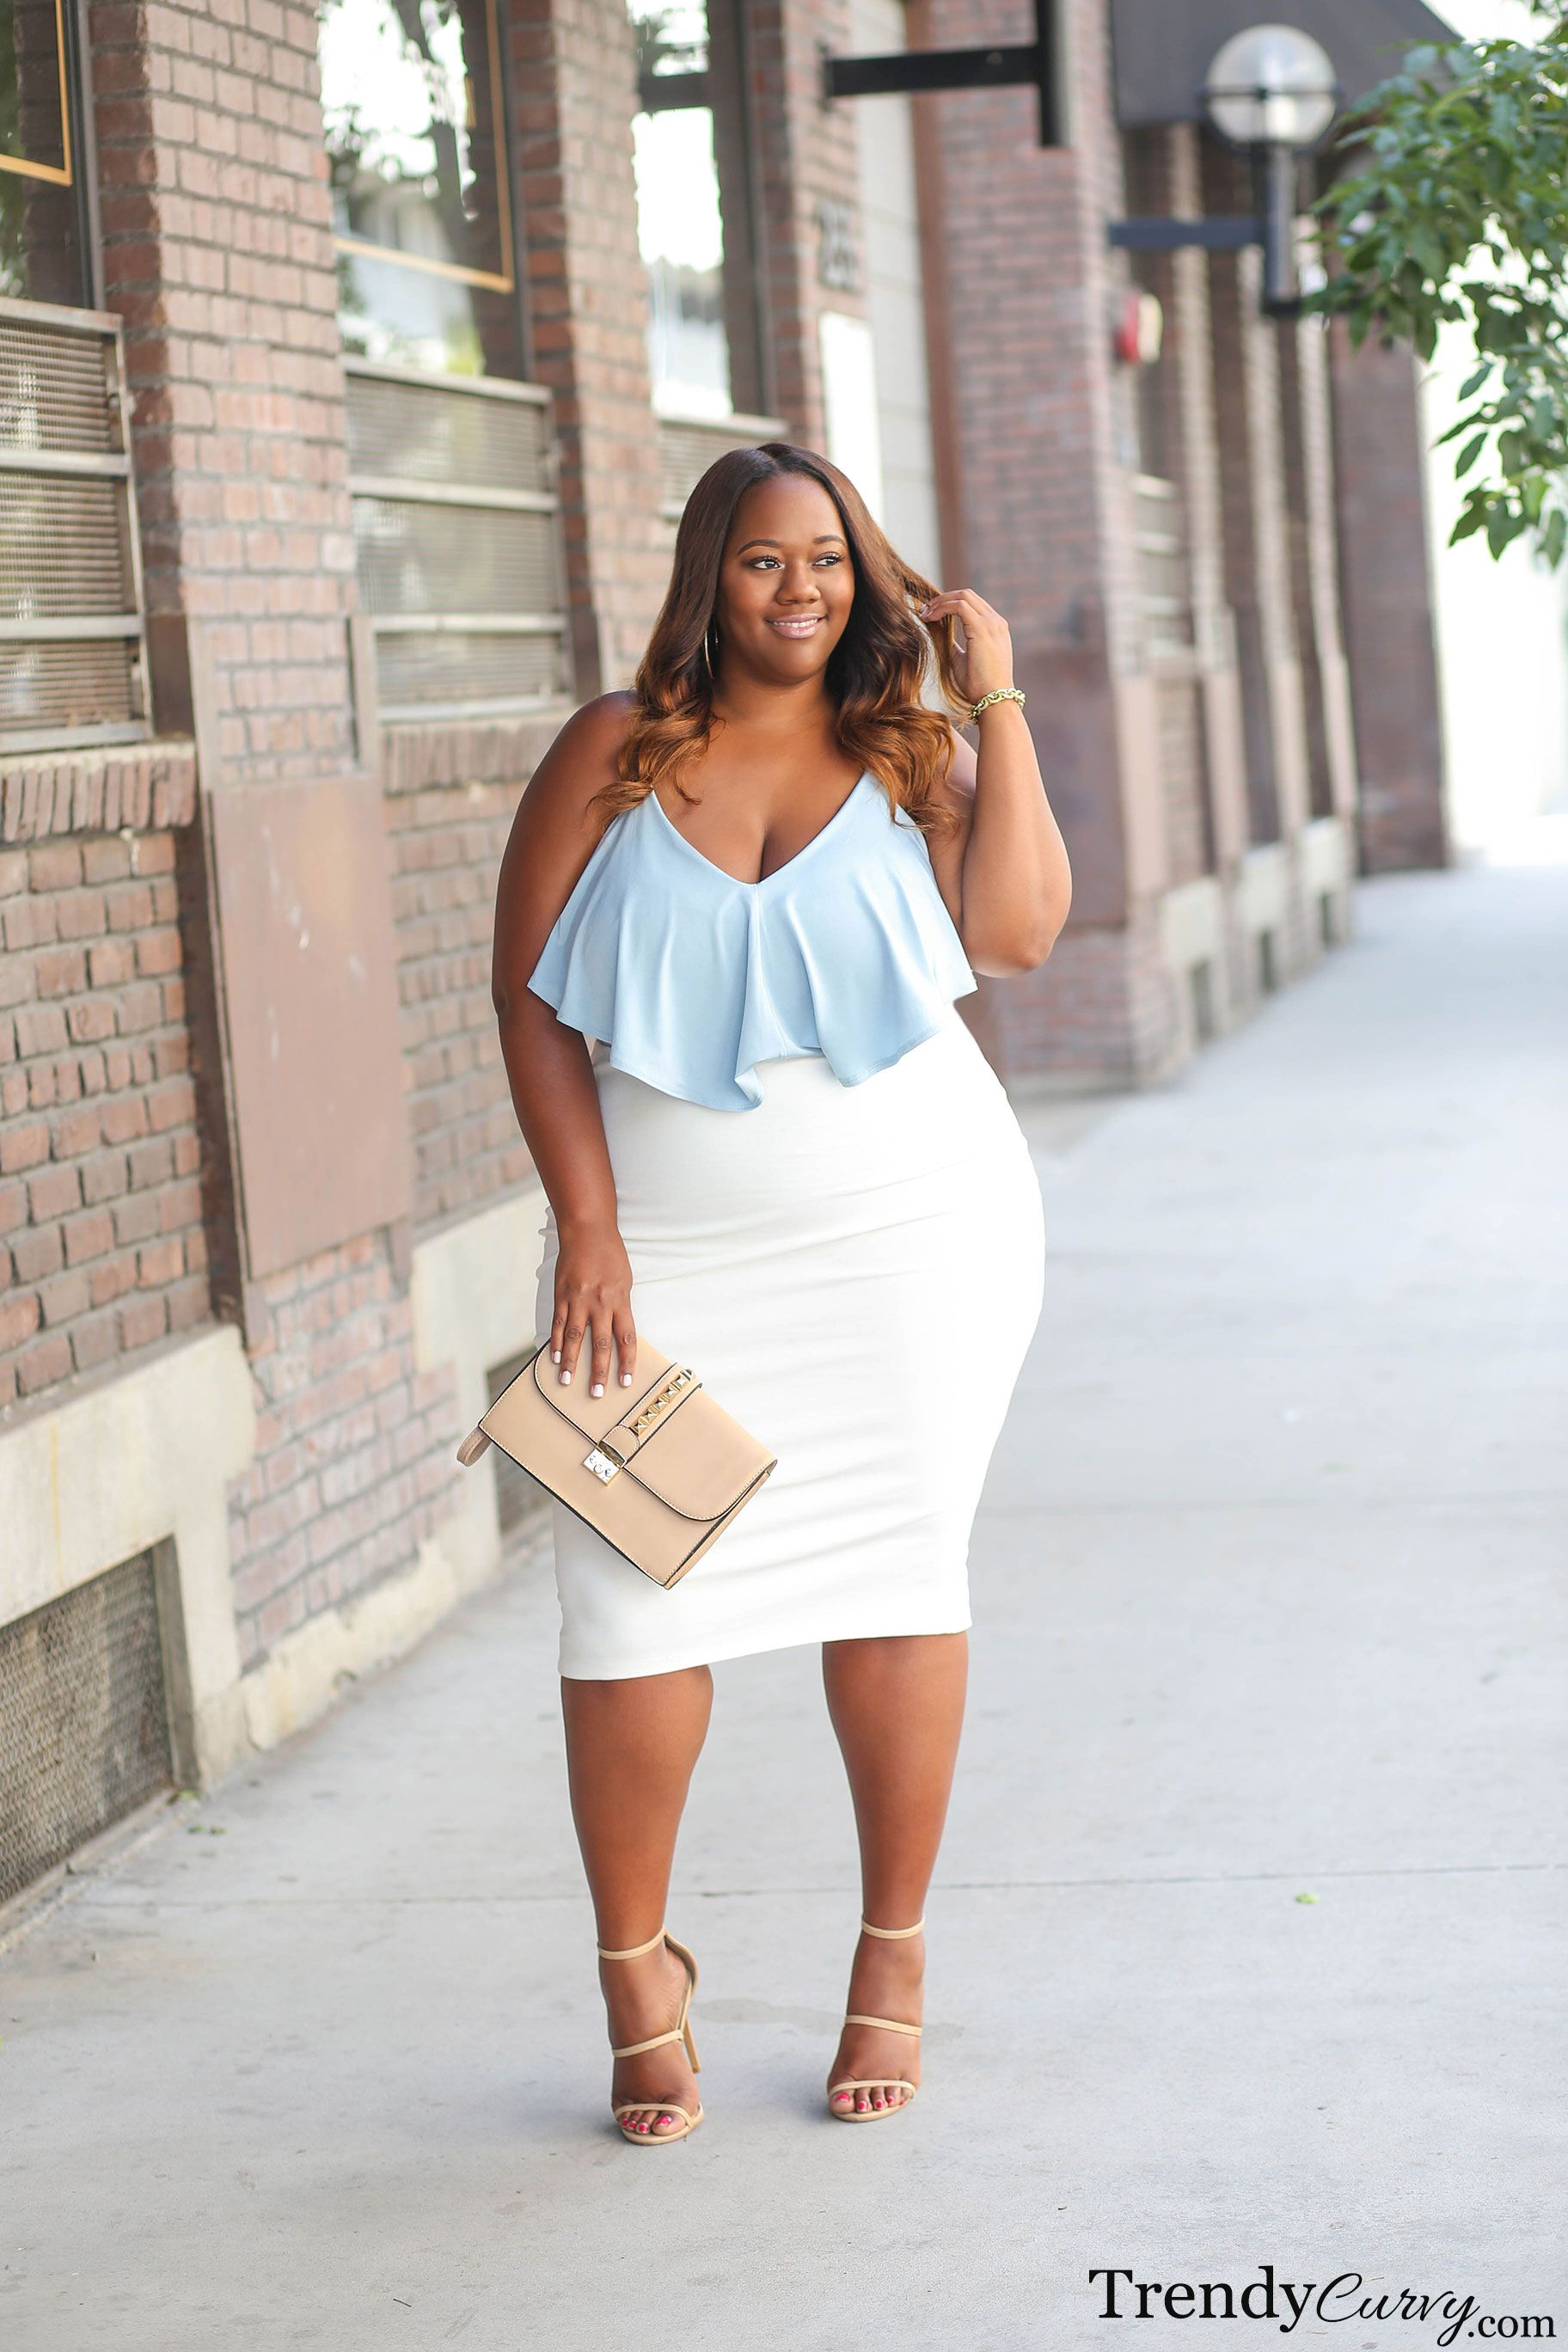 summer chic plus size fashion fashion blogger curvy girls pinterest summer chic. Black Bedroom Furniture Sets. Home Design Ideas